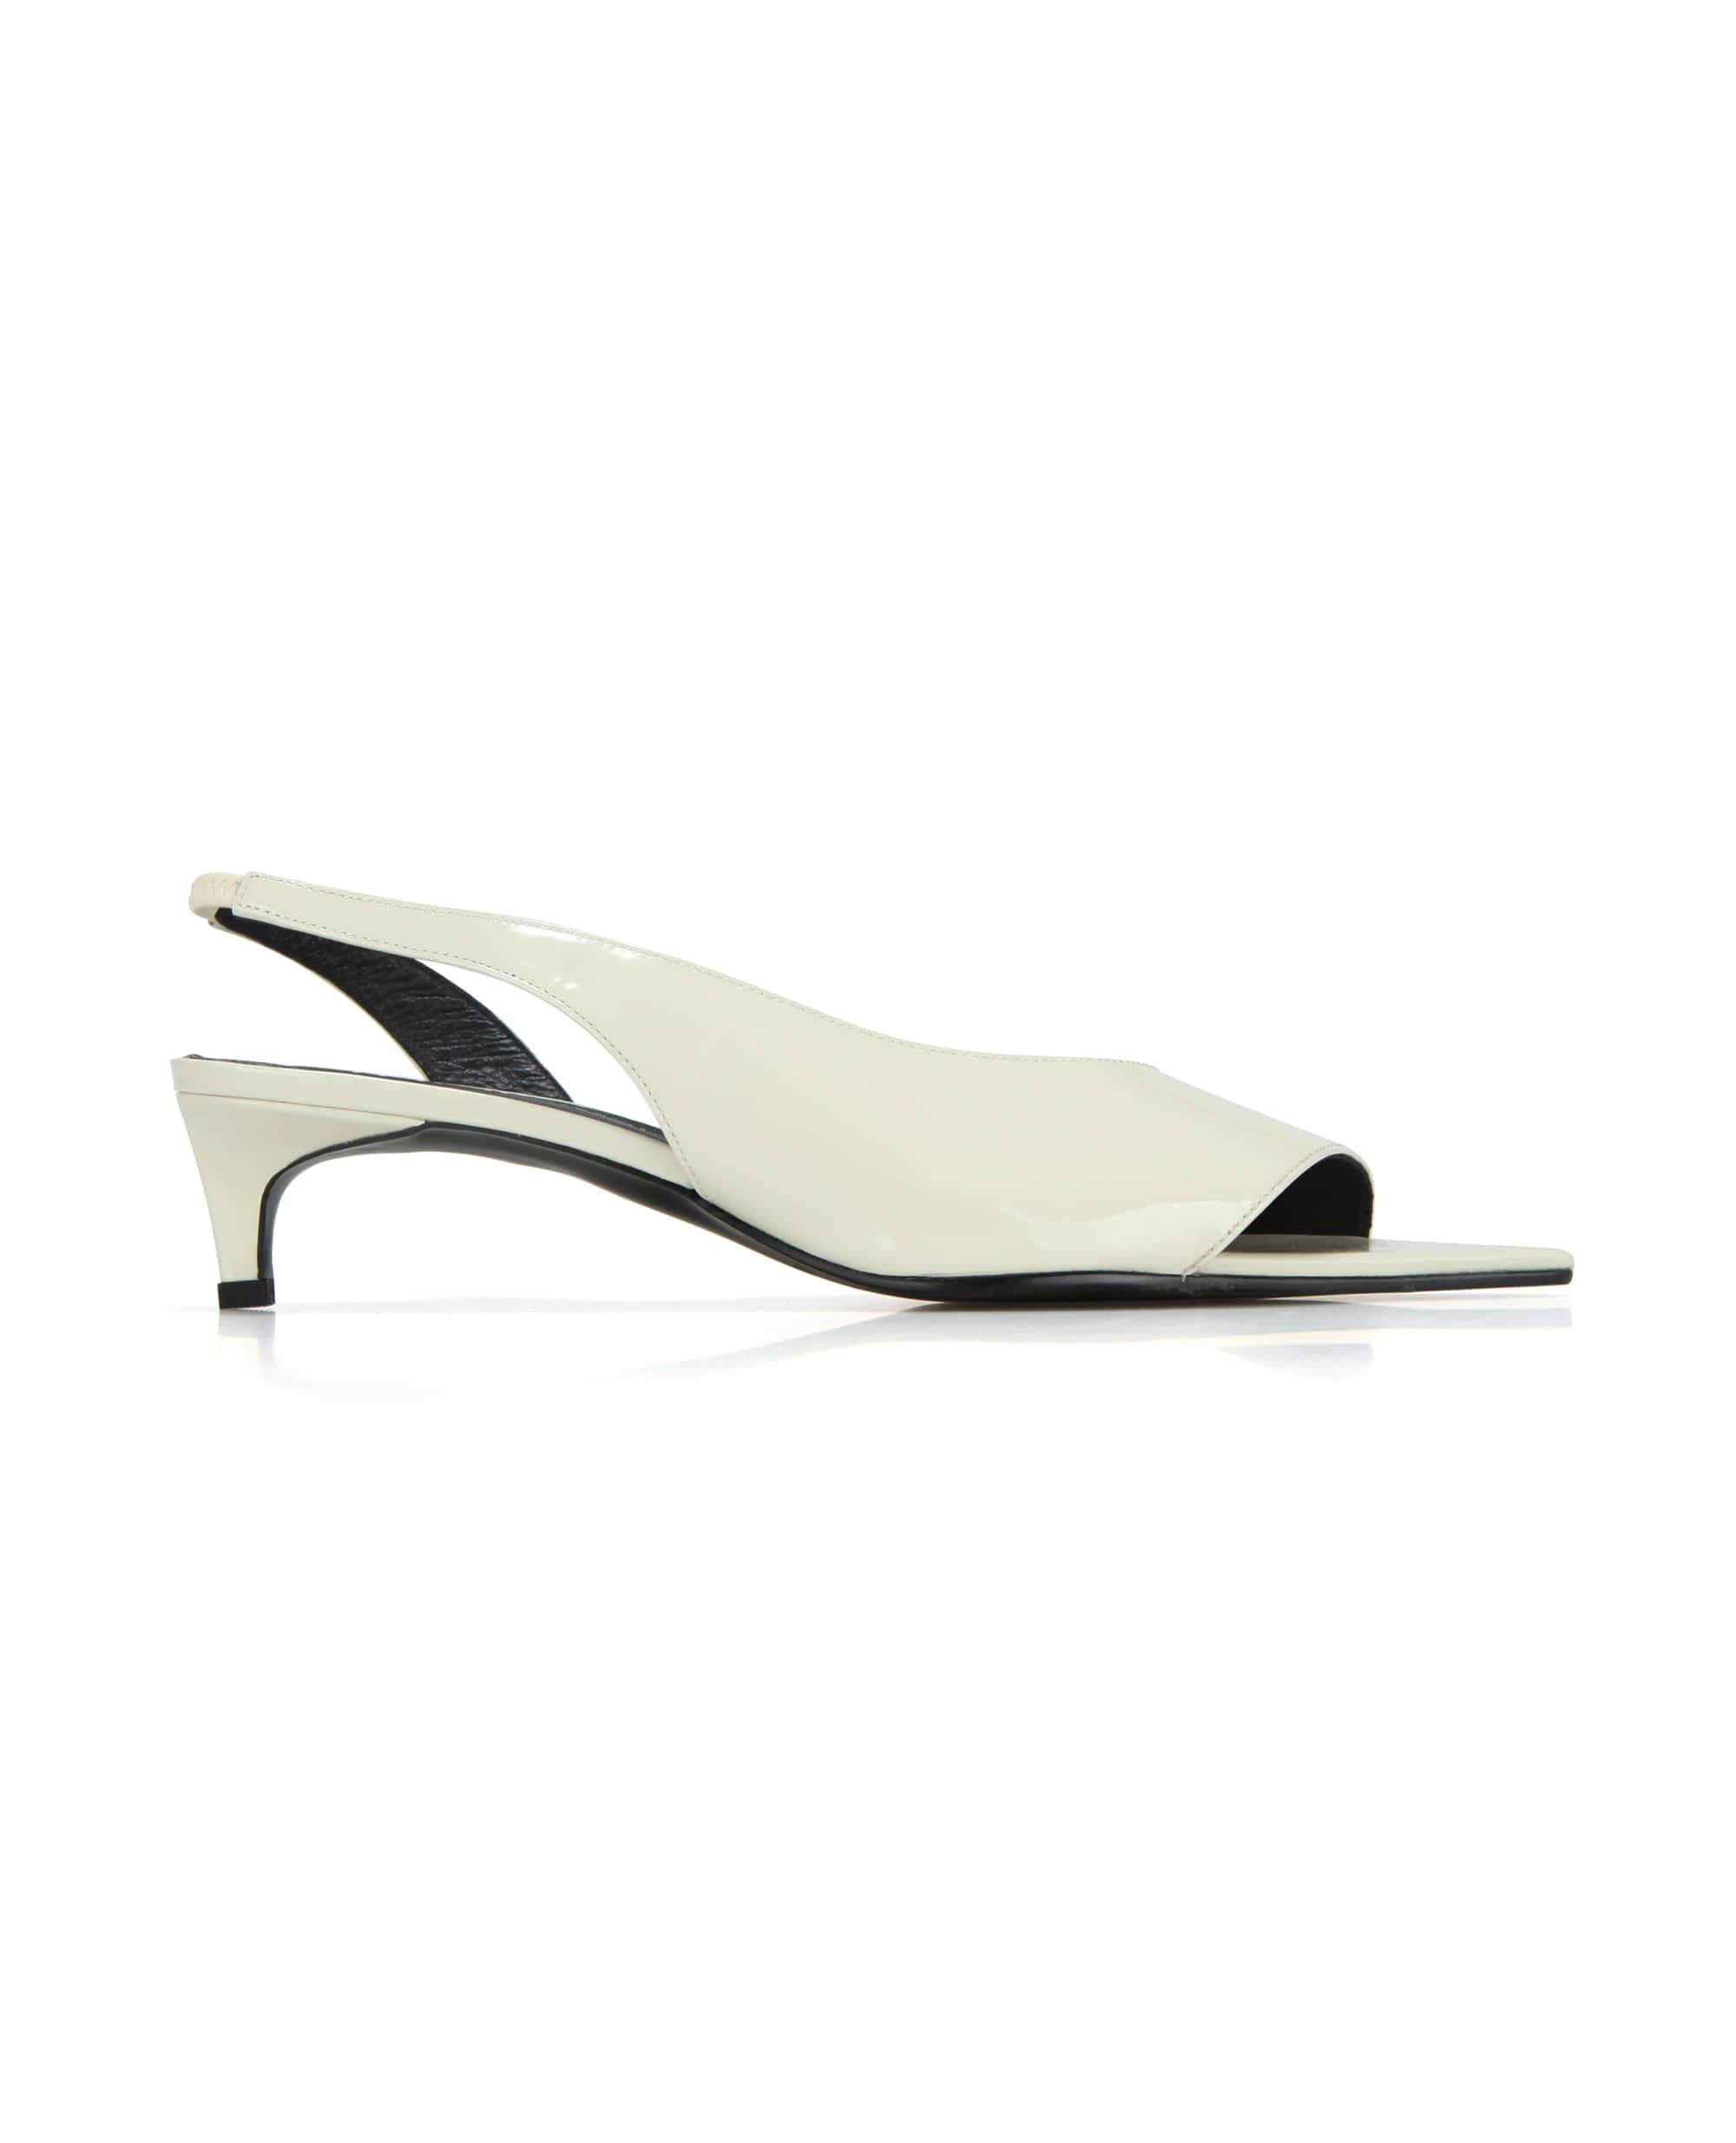 Extreme sharp toe diagonal lined slingbacks | Glossy butter